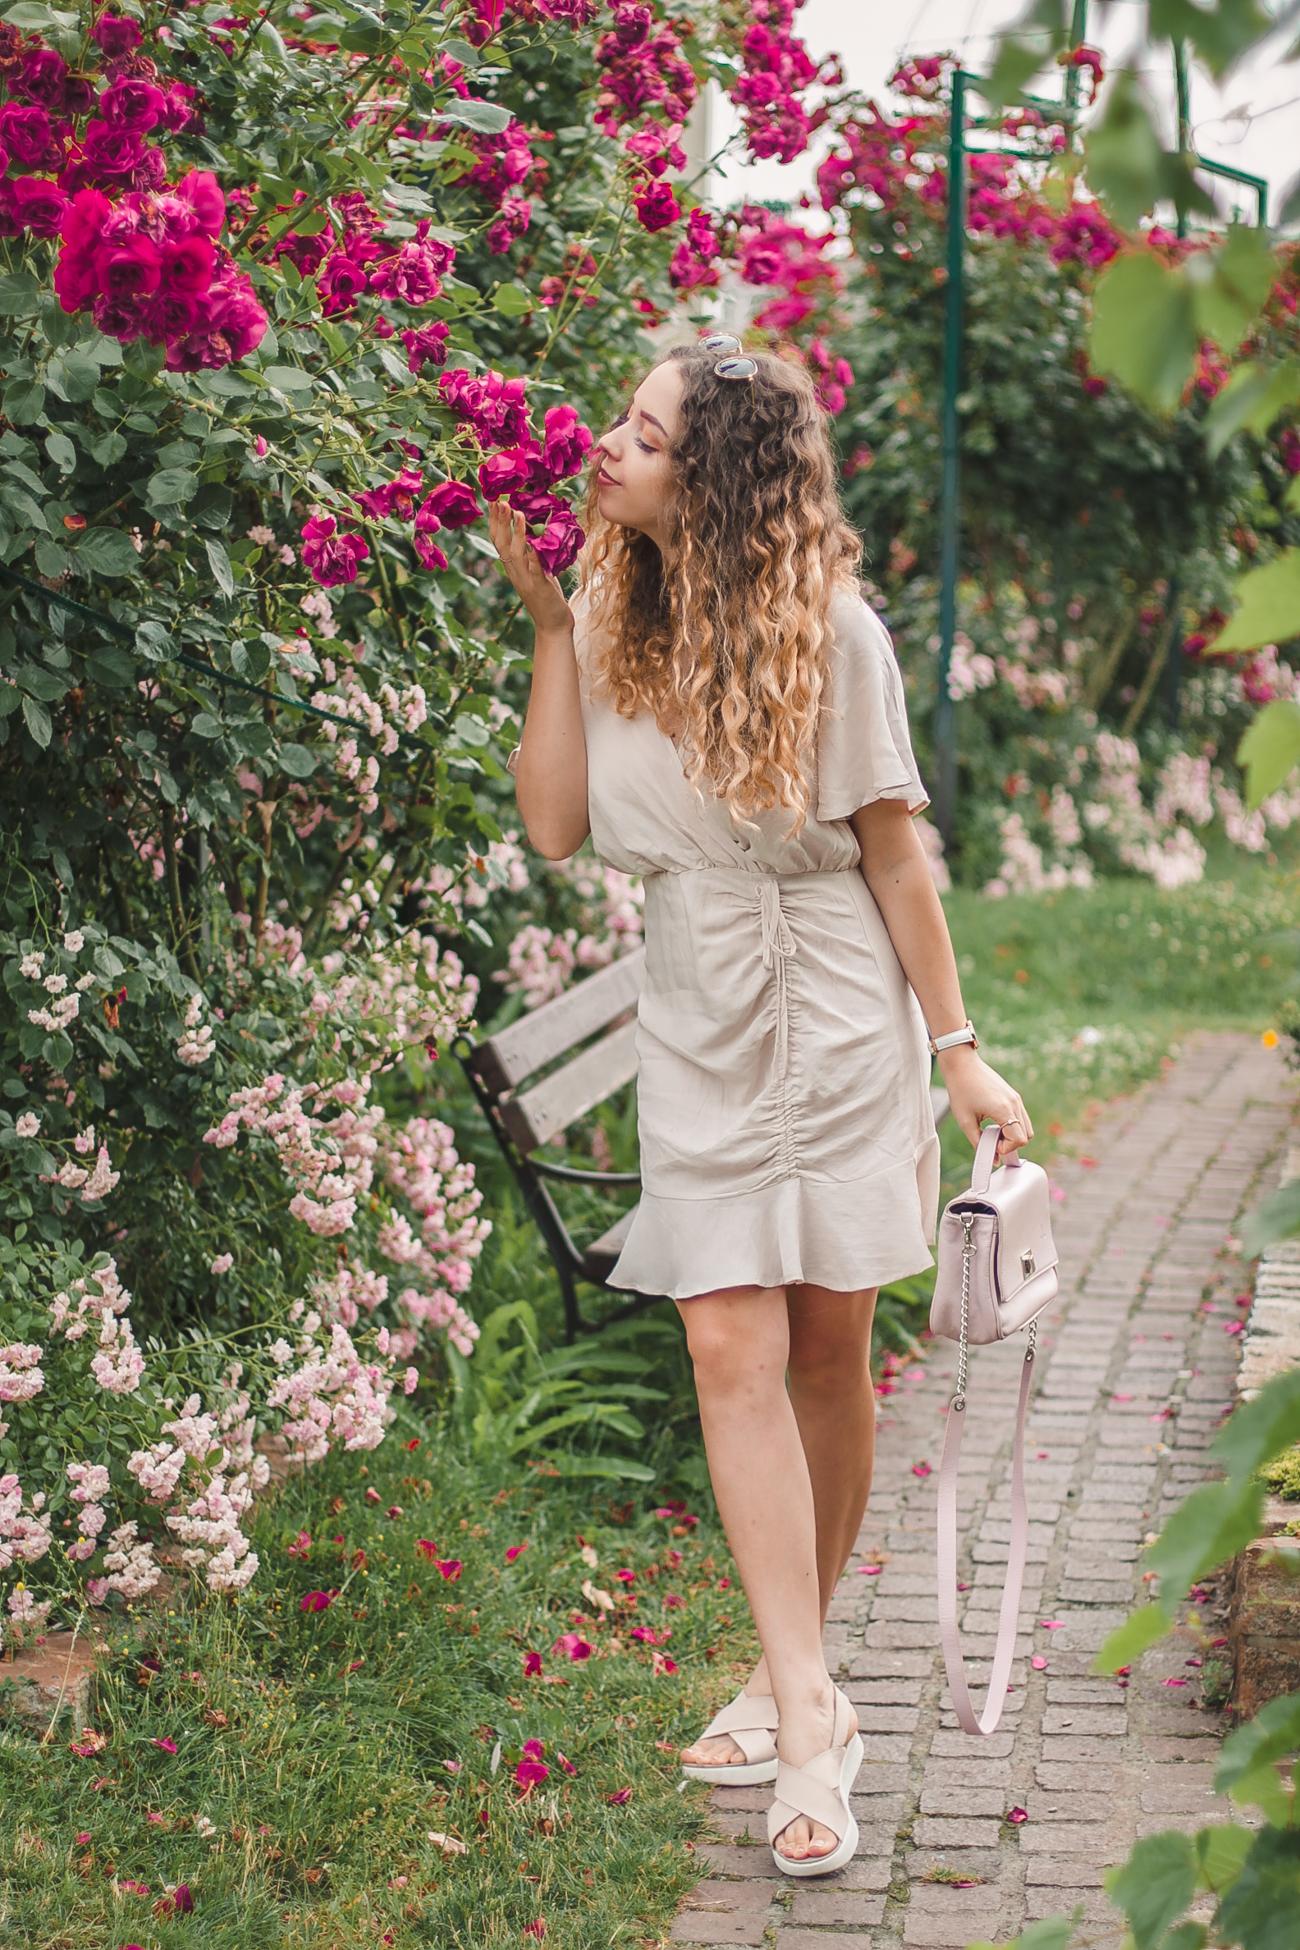 sukienka falbanka na lato